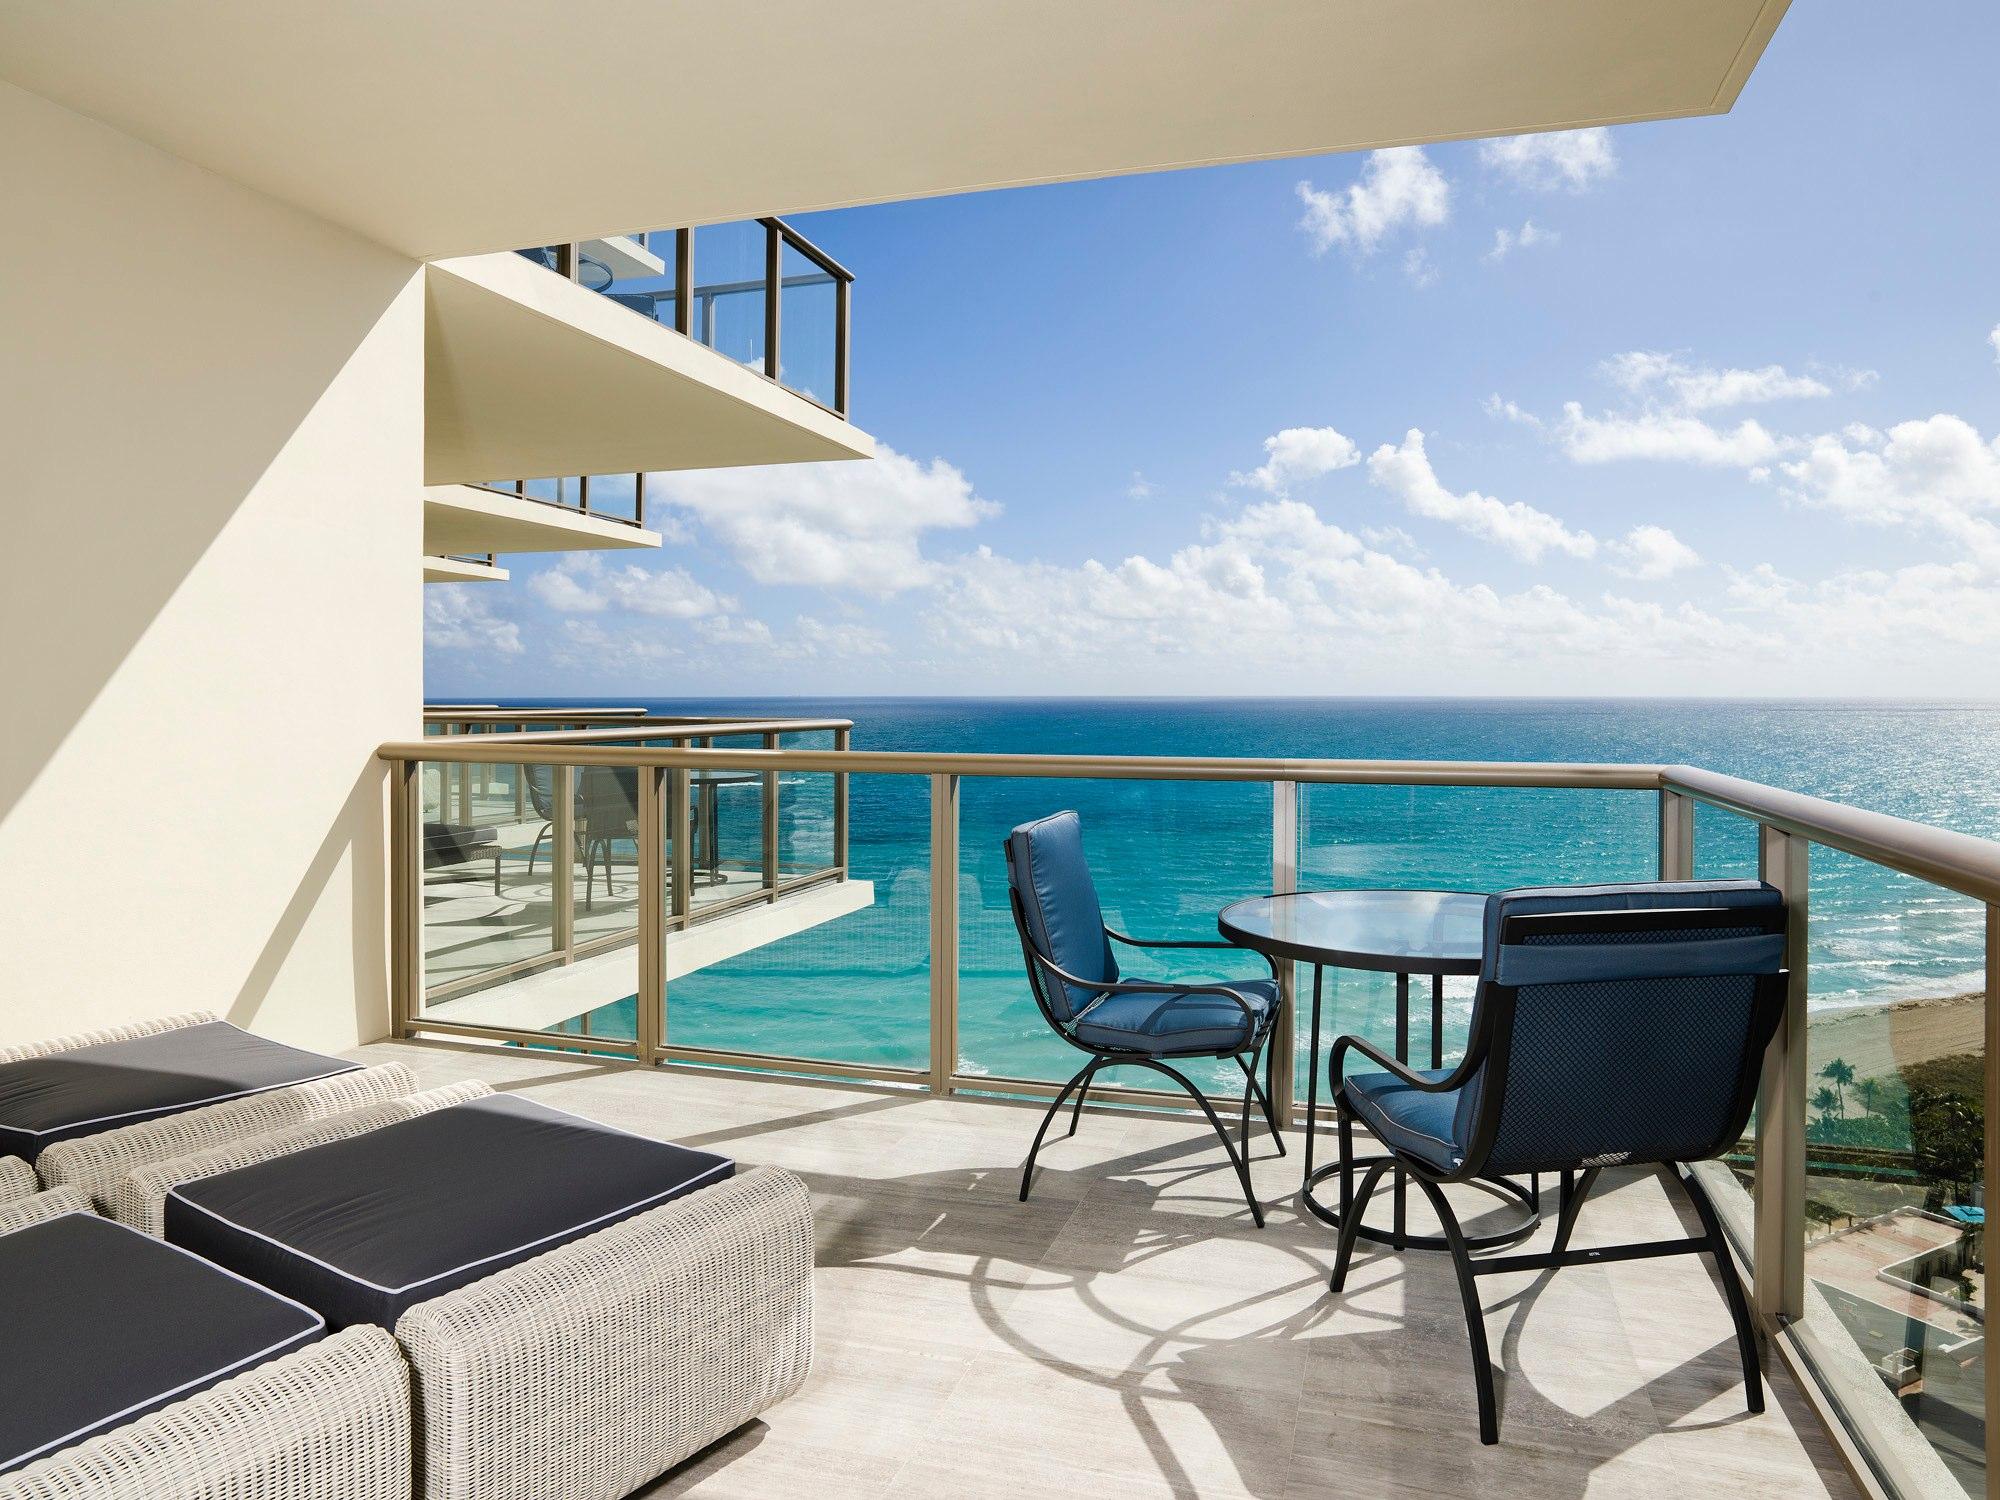 st regis bal harbour condos st regis condos bal harbour. Black Bedroom Furniture Sets. Home Design Ideas